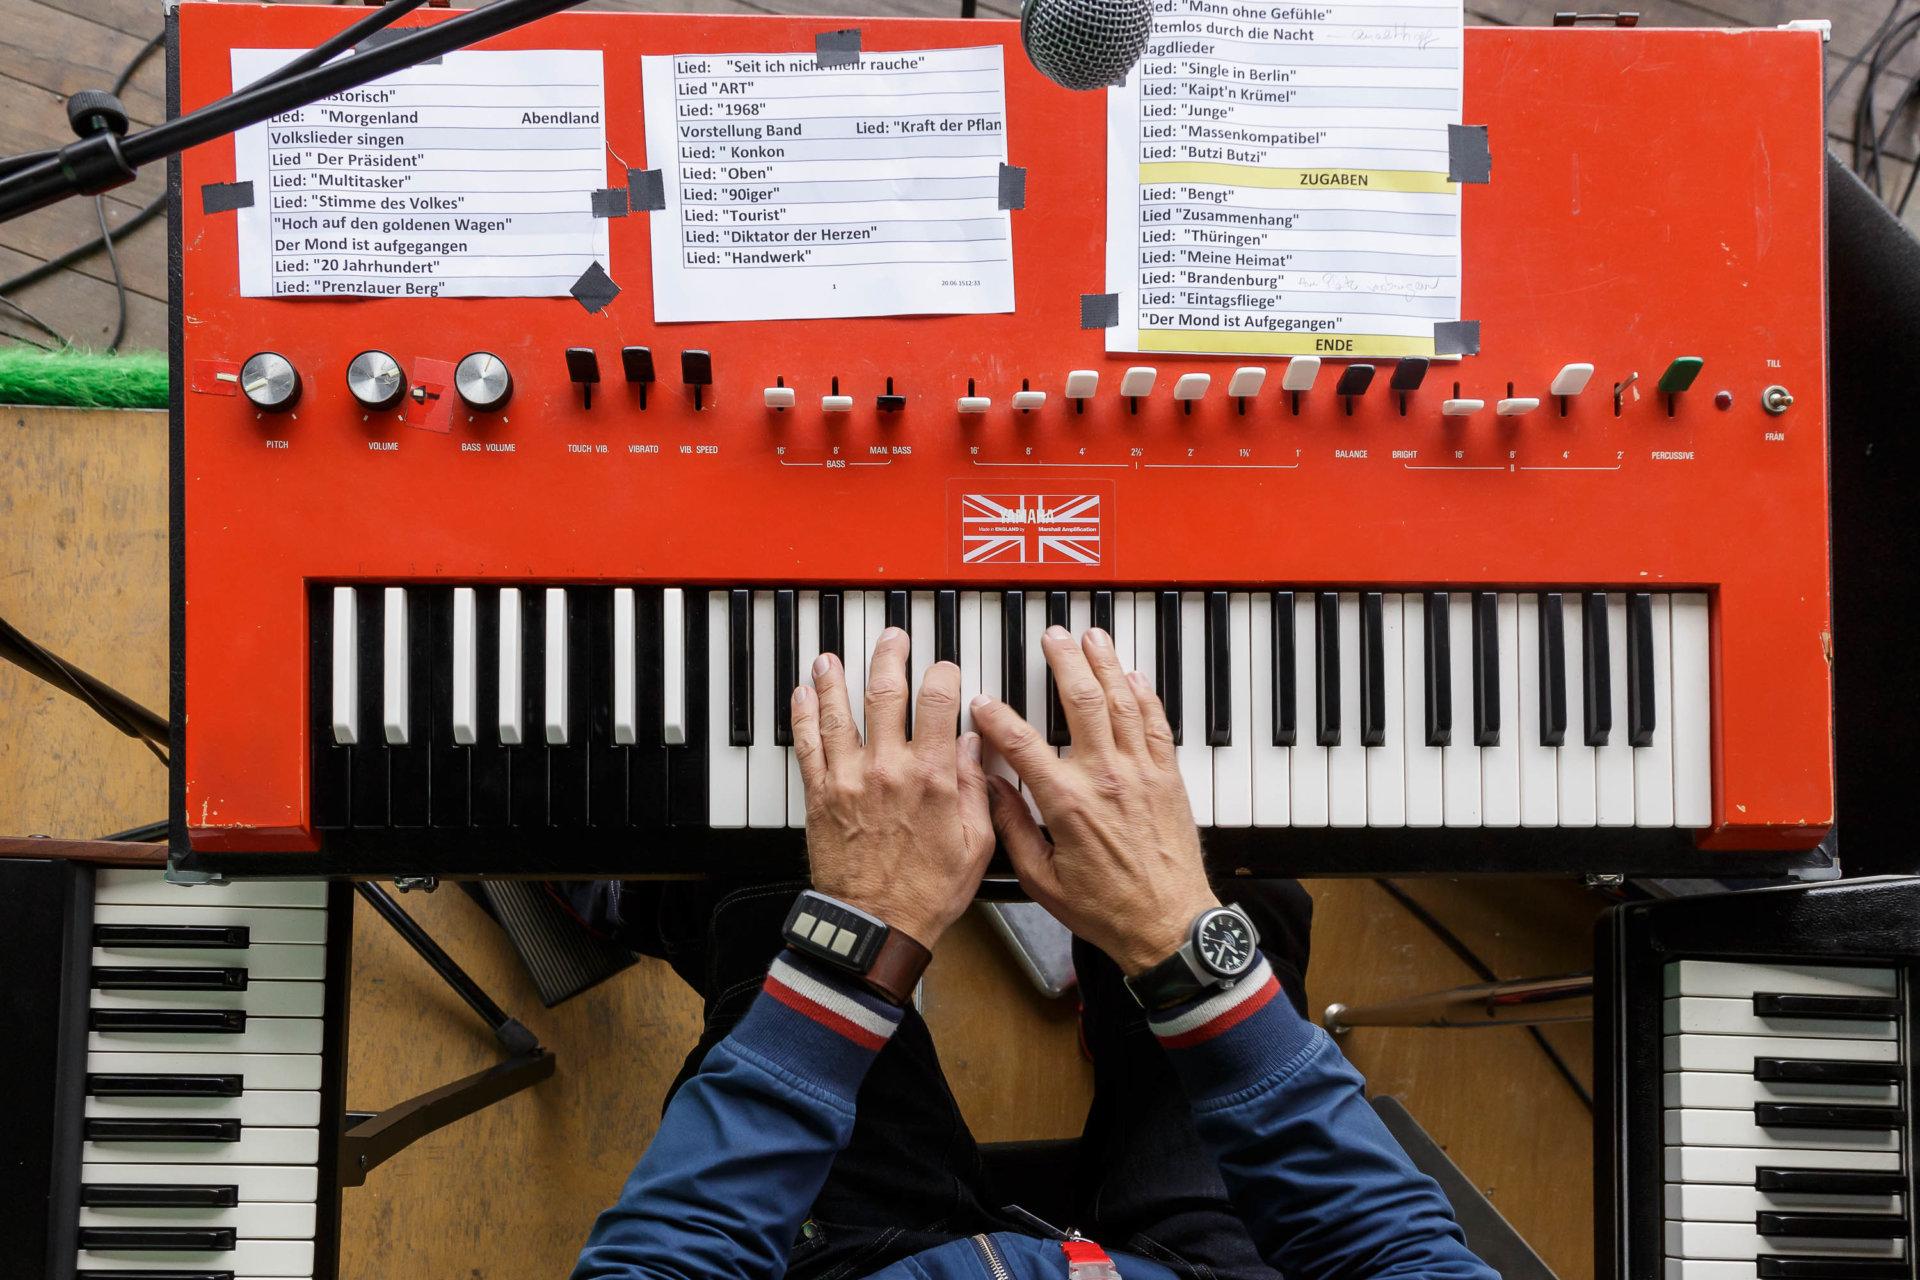 Buddy Casino, DRUCKEN!, Kultur, Künstler, MASTERBILD, Pianist, Projekt, Serie, Tastatur, Wuhlheide, bühne, grebe, klavier, konzert, meisterfinger, musik, musiker, open-air, piano, tasten